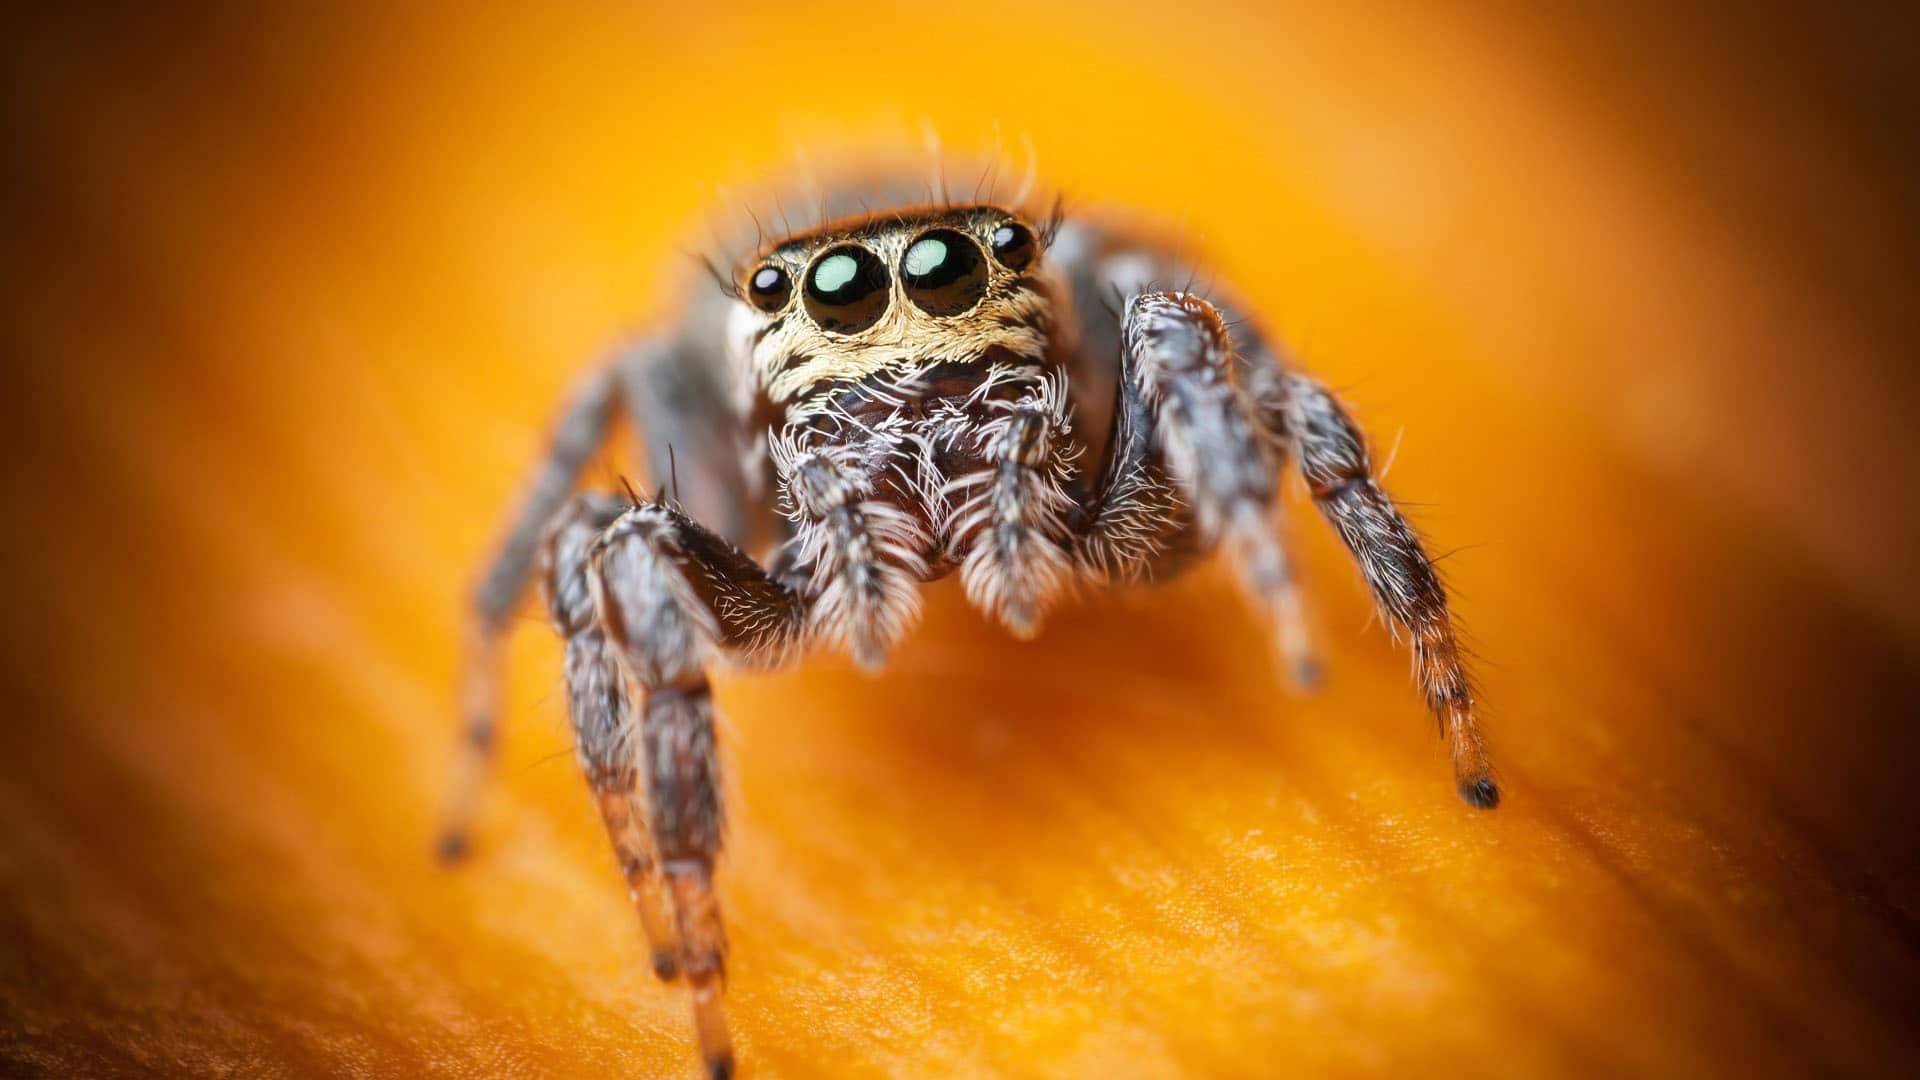 Cute Jumping Spider Wallpaper Spiders Looking Cute Viral Rang